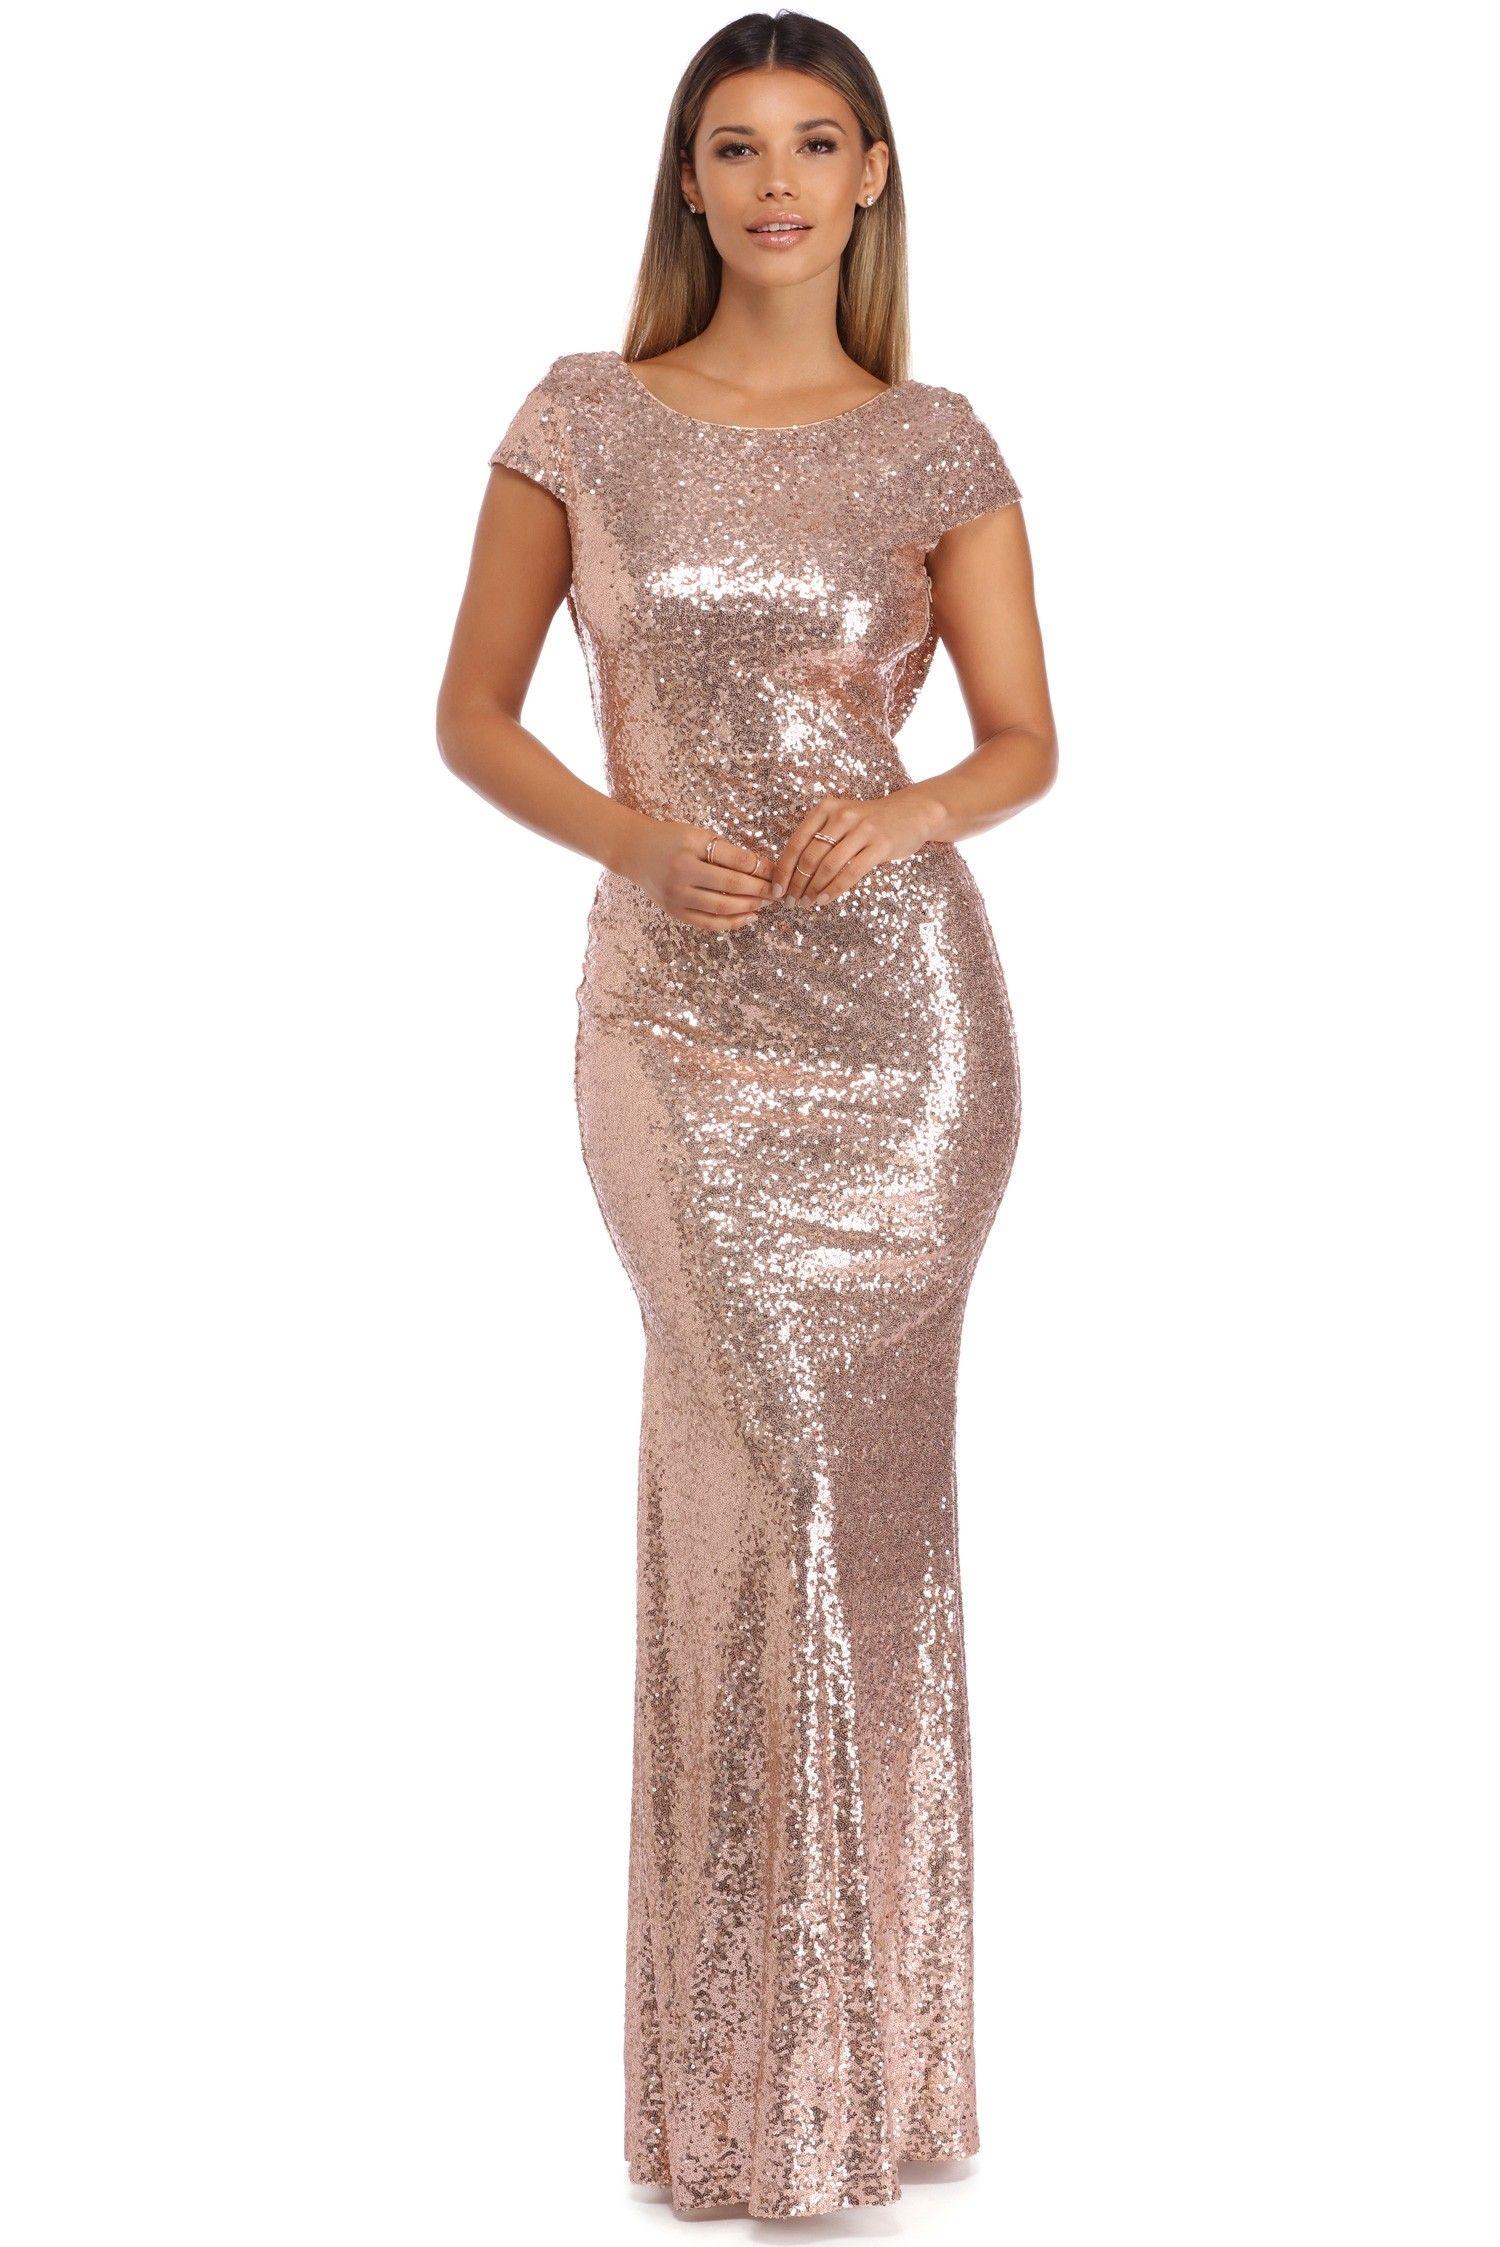 3e2ce8313f8 Plus Sivan Golden Glam Sequin Dress in 2019